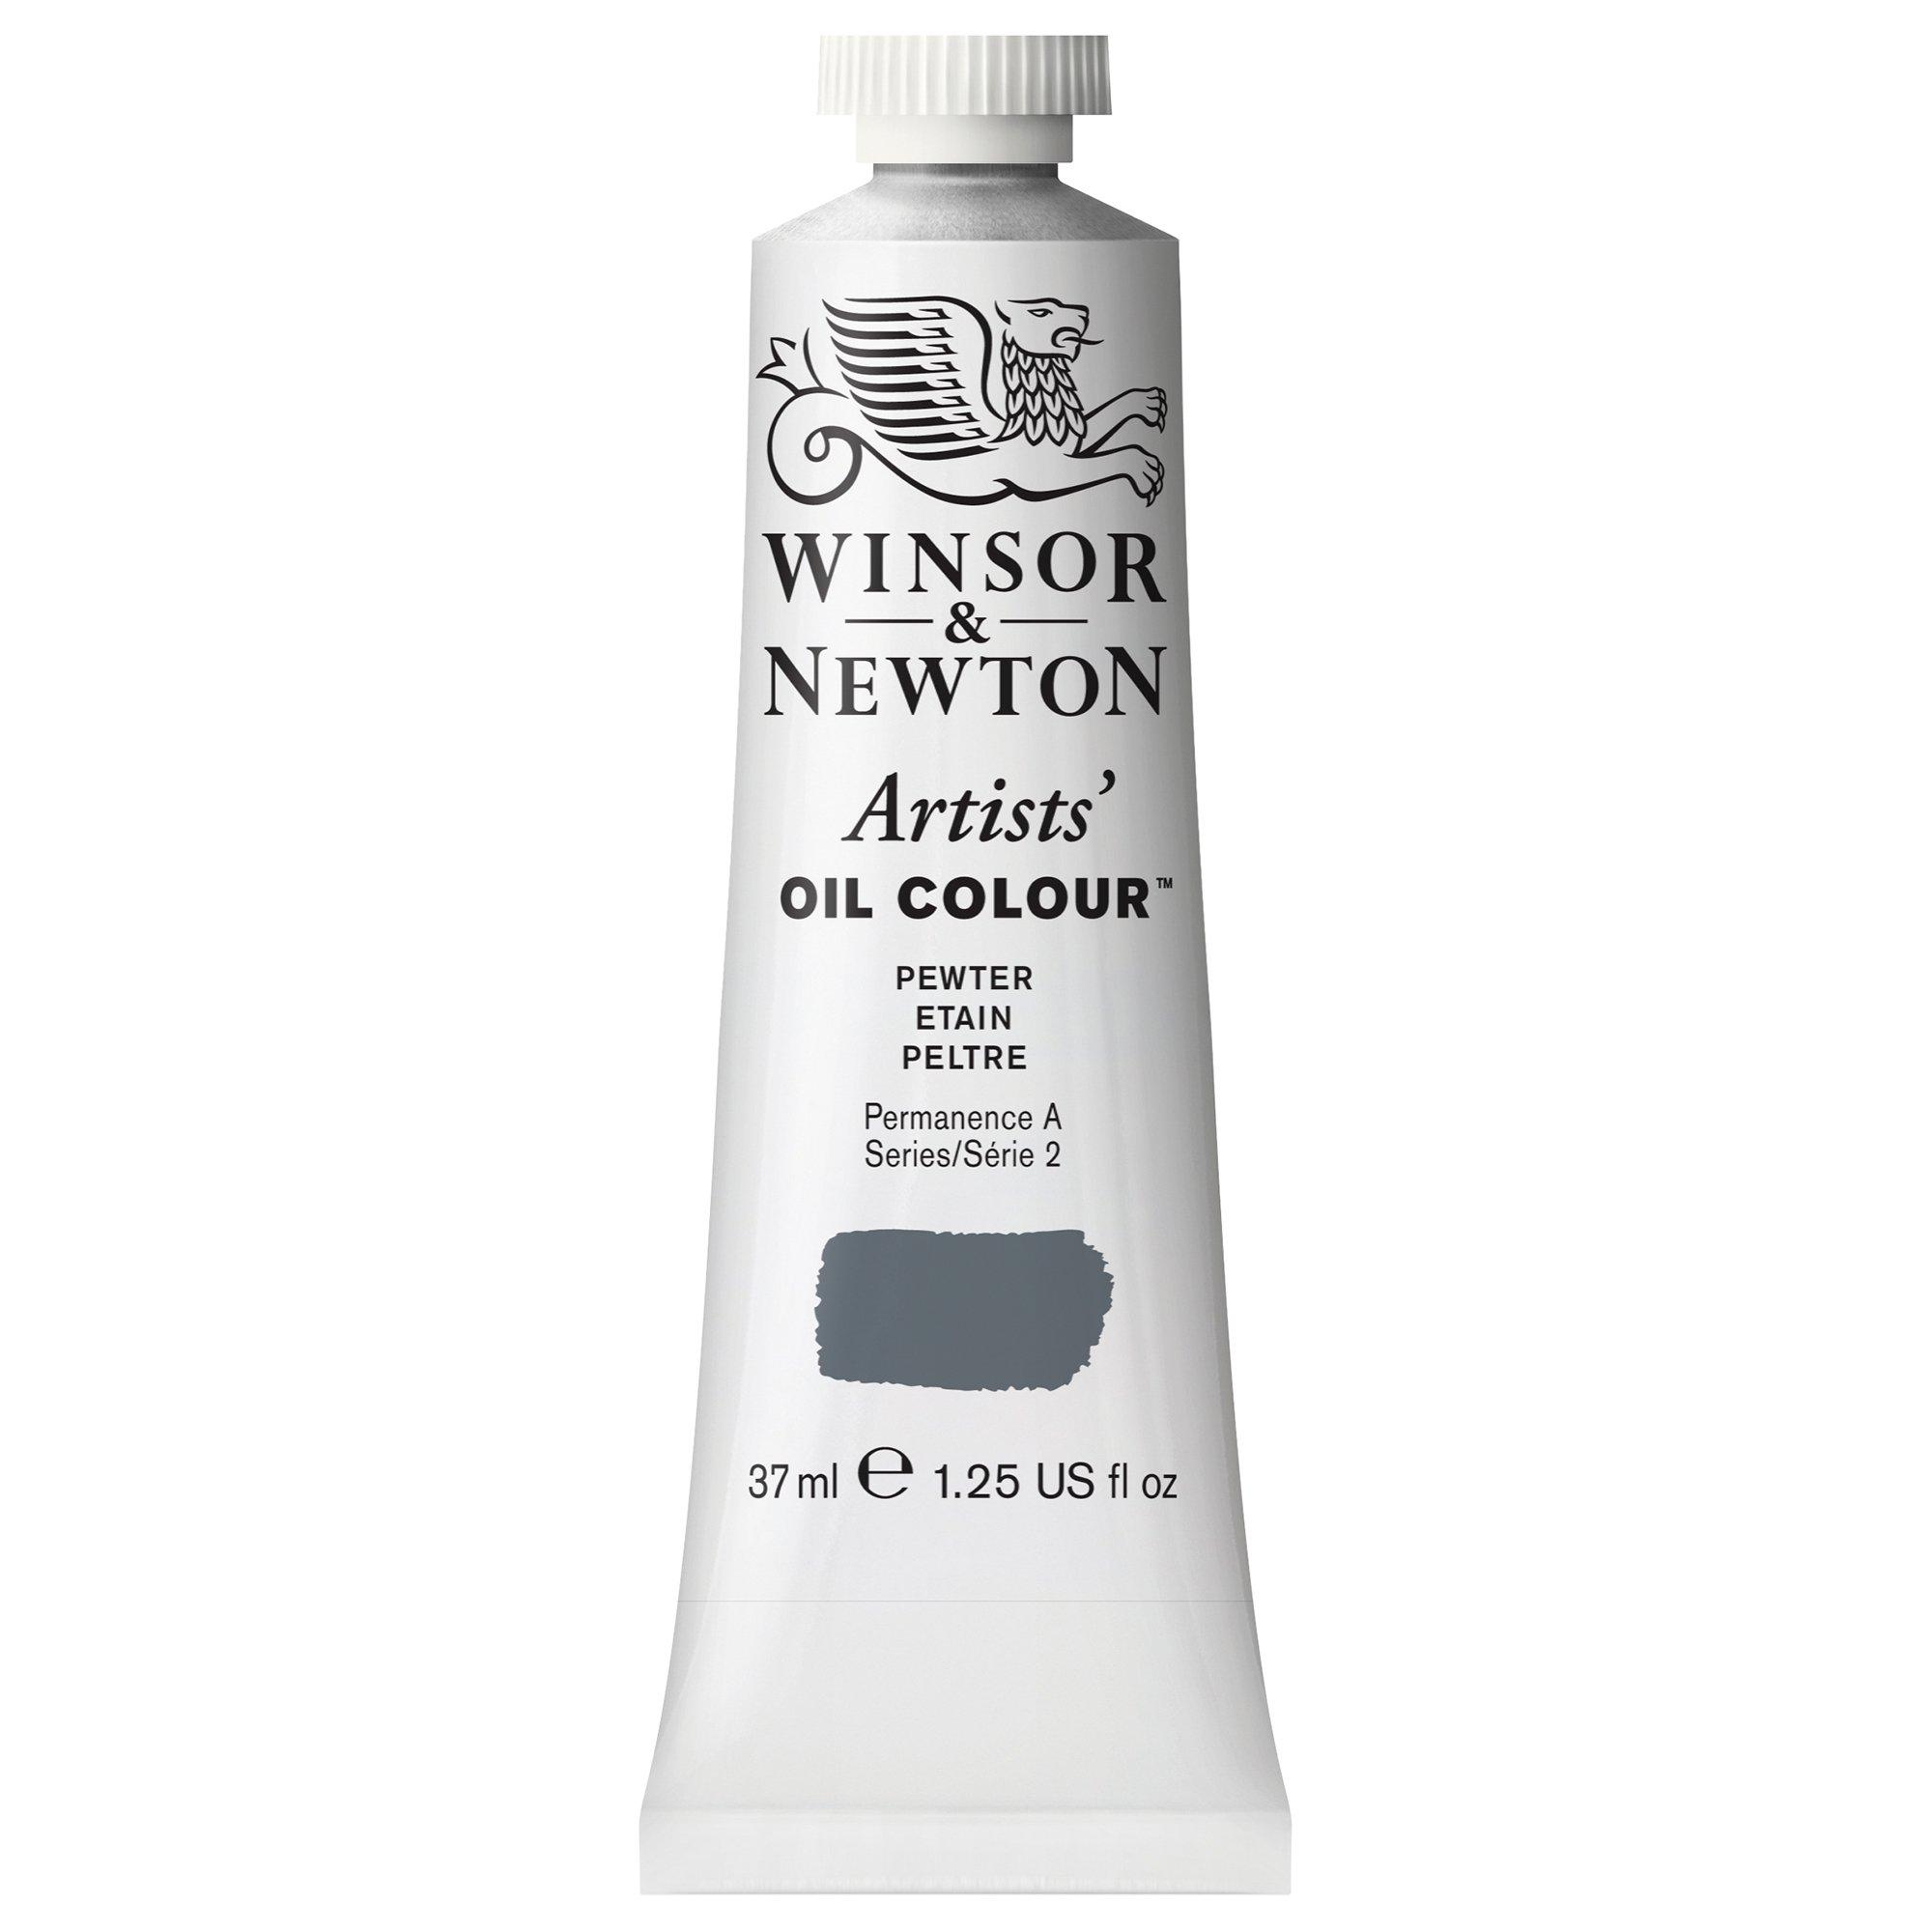 Winsor & Newton Artists' Oil Colour Paint, 37ml Tube, Pewter